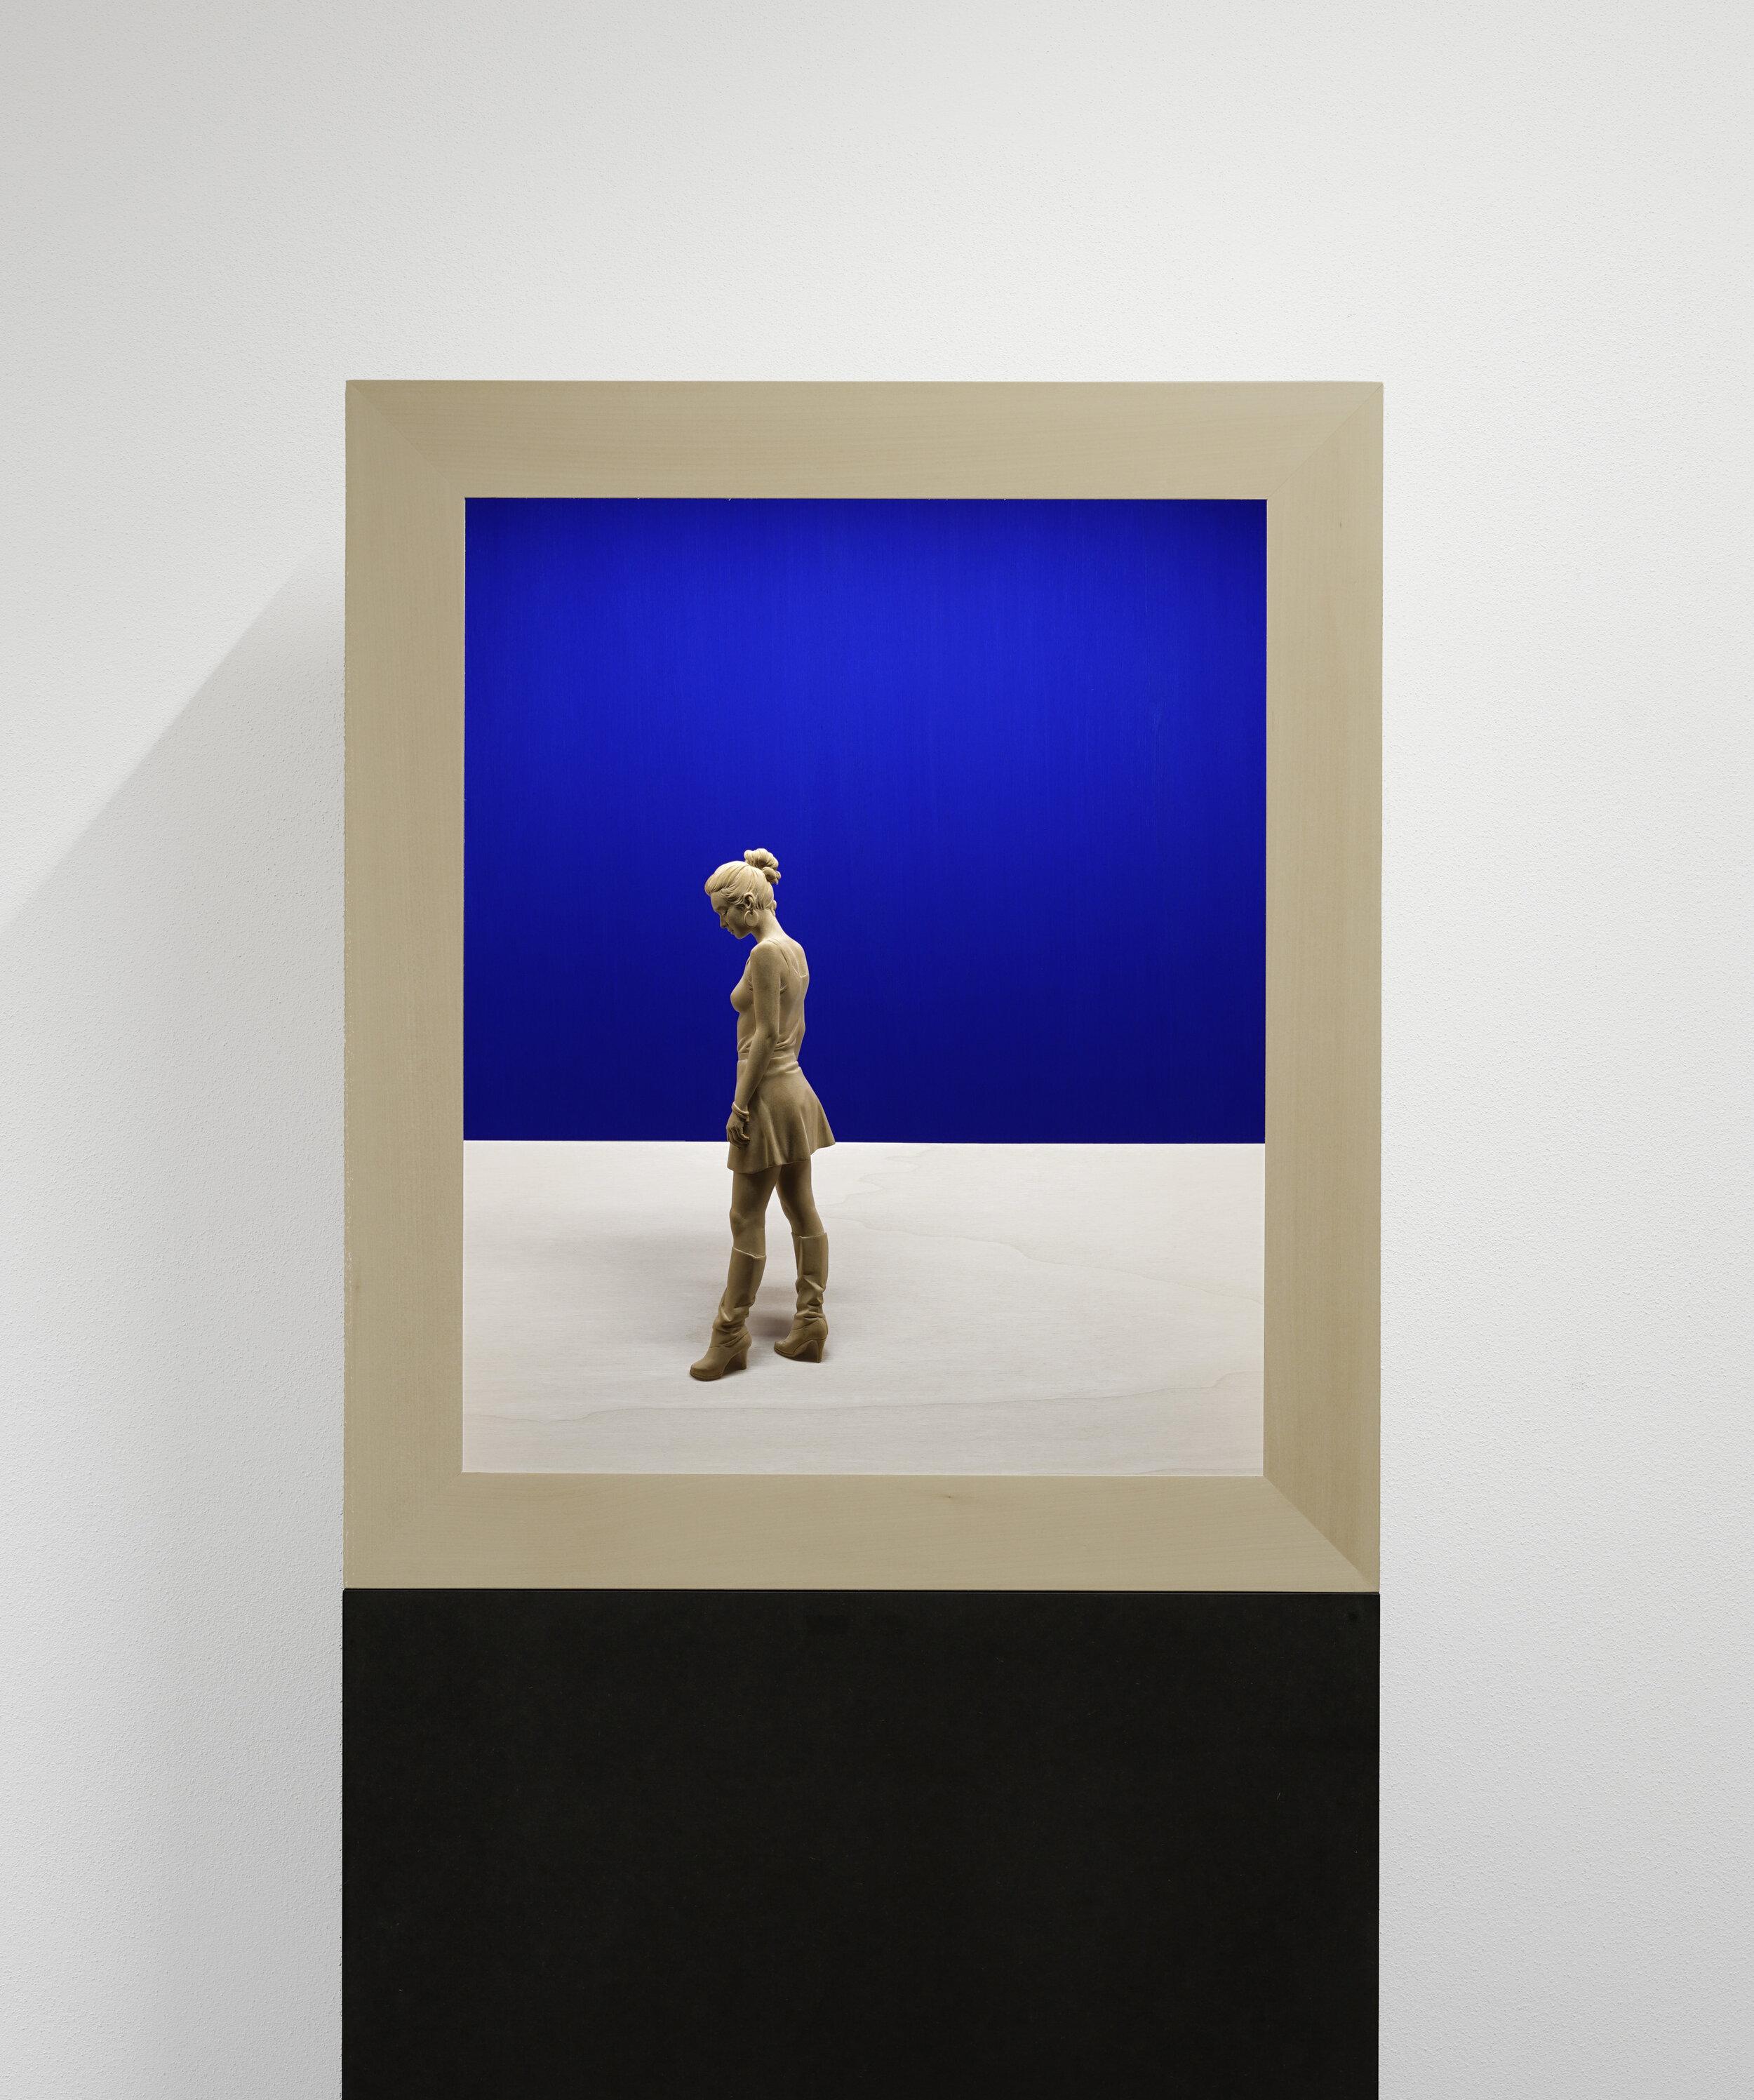 Walking Girl,  2019 Linden wood, acrylic paint, LED light 27 1/2 x 23 1/2 x 8 inches